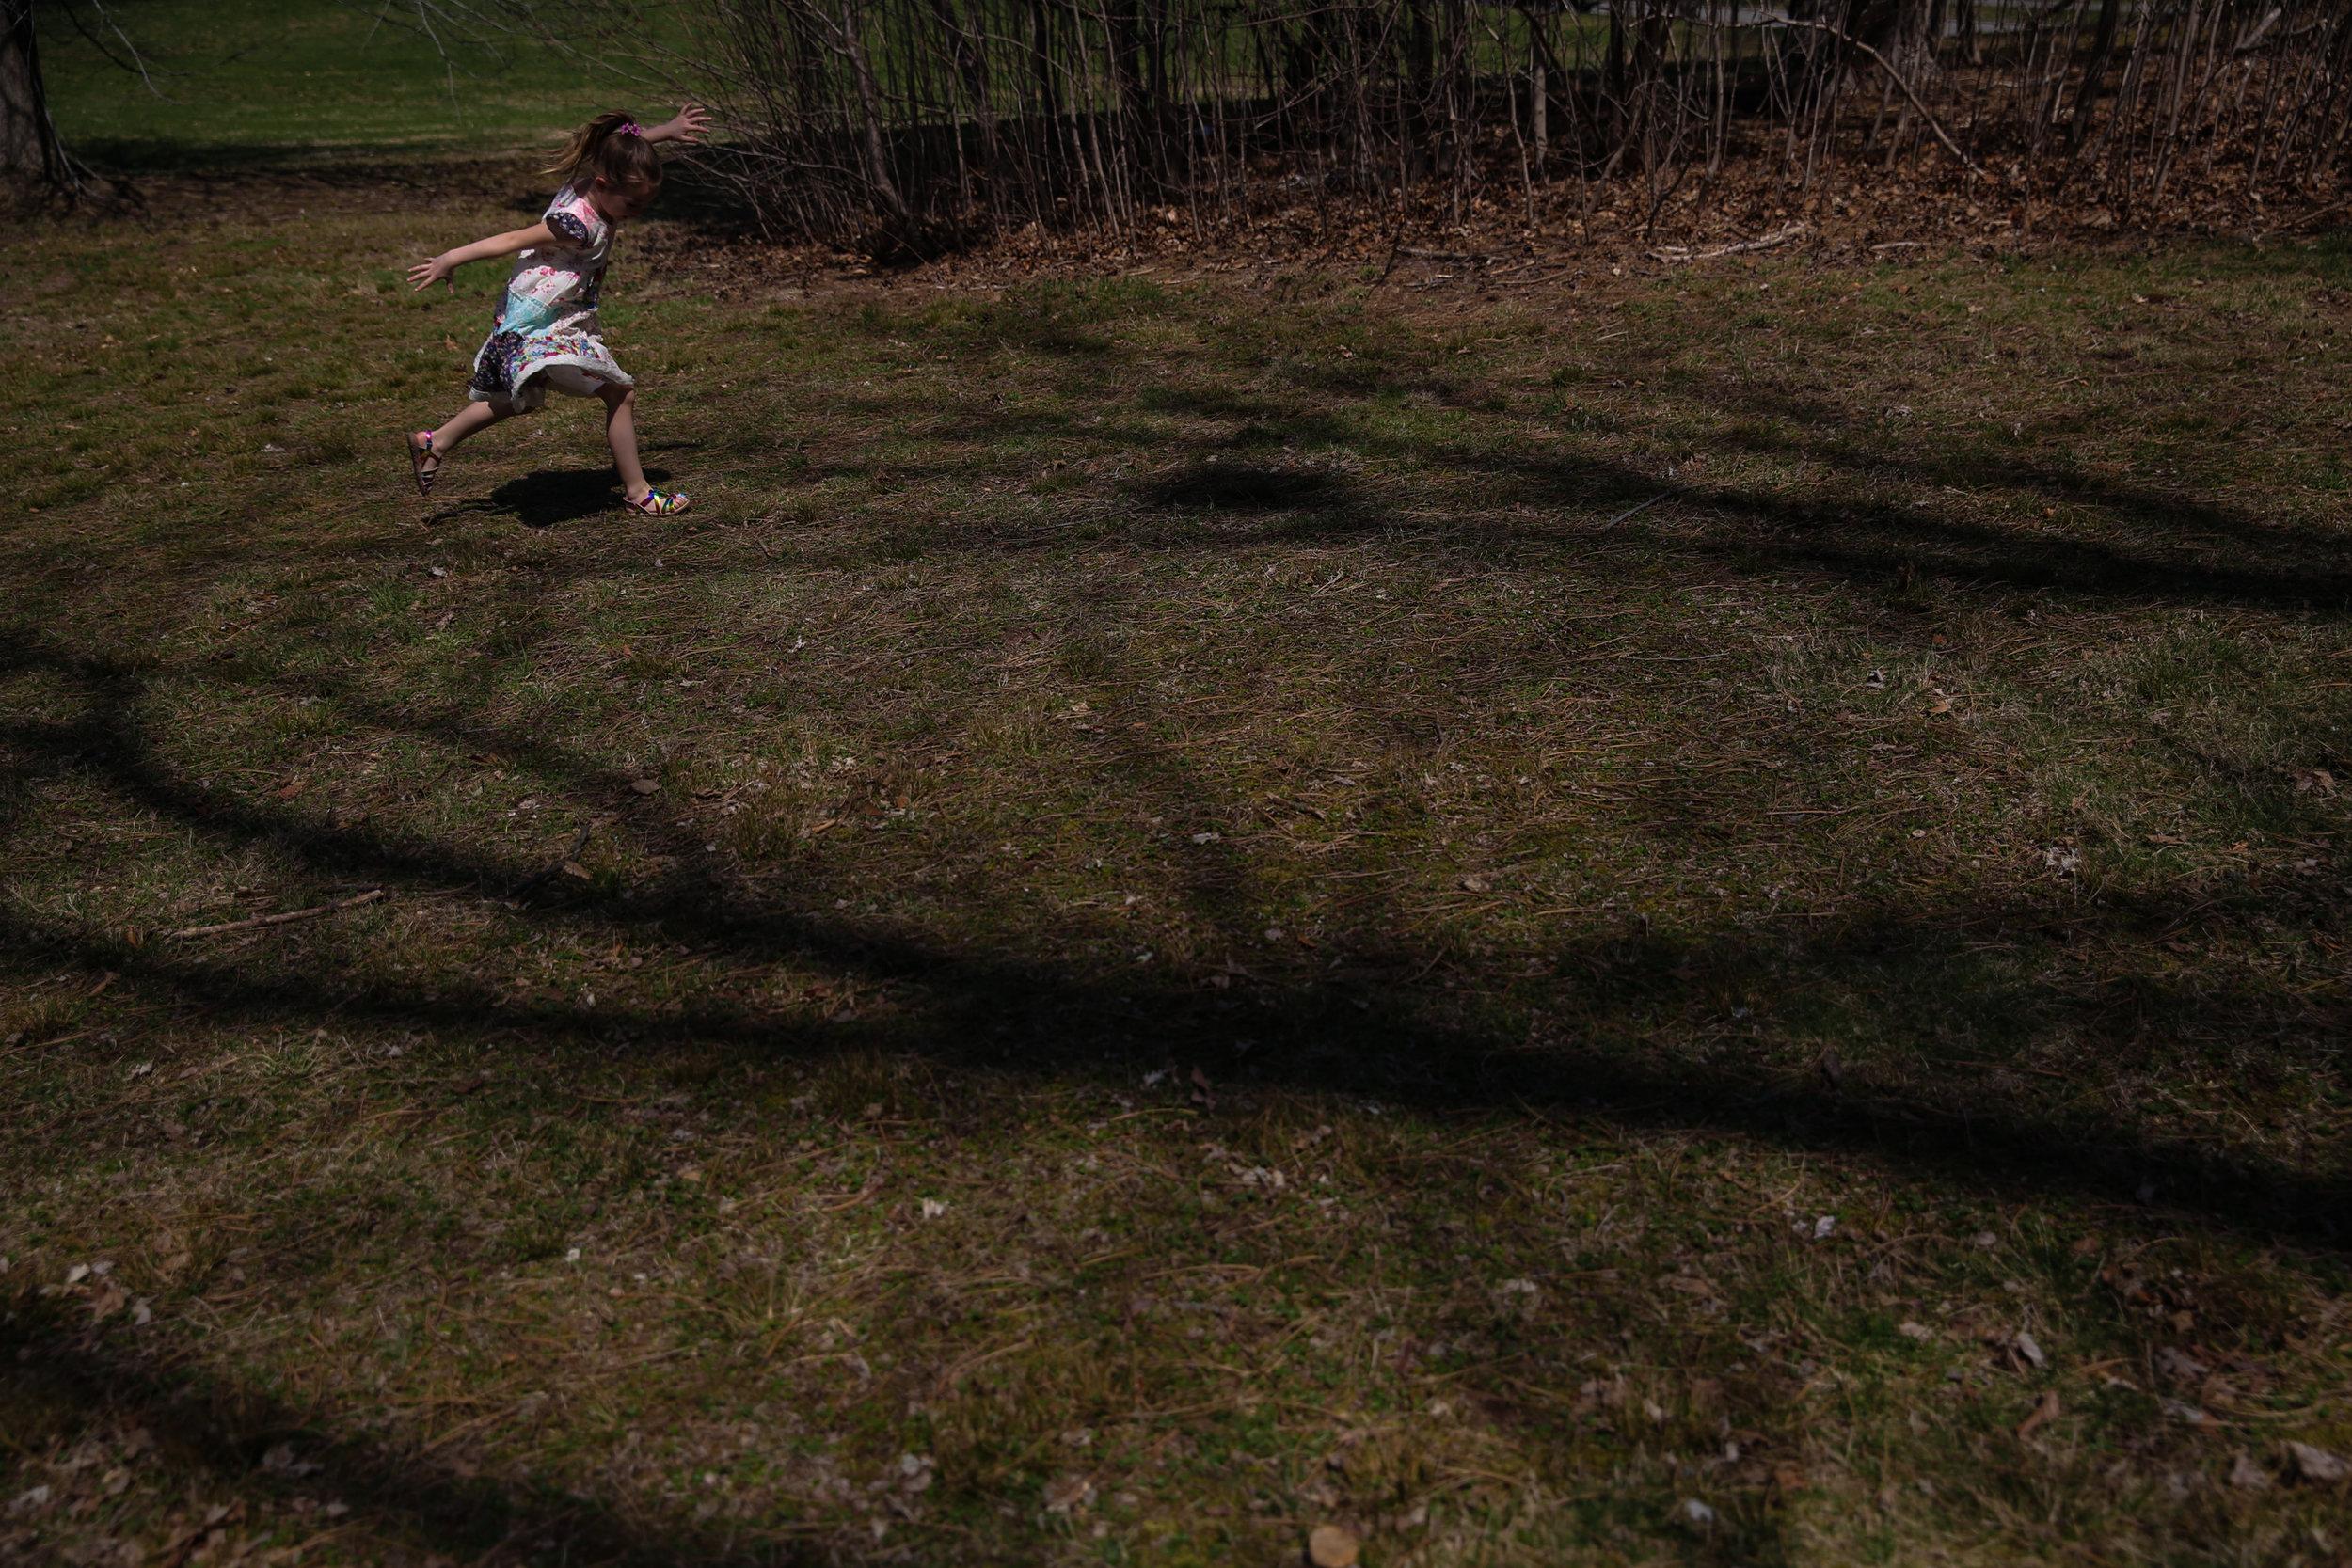 Girl frolics through tree shadowed lawn